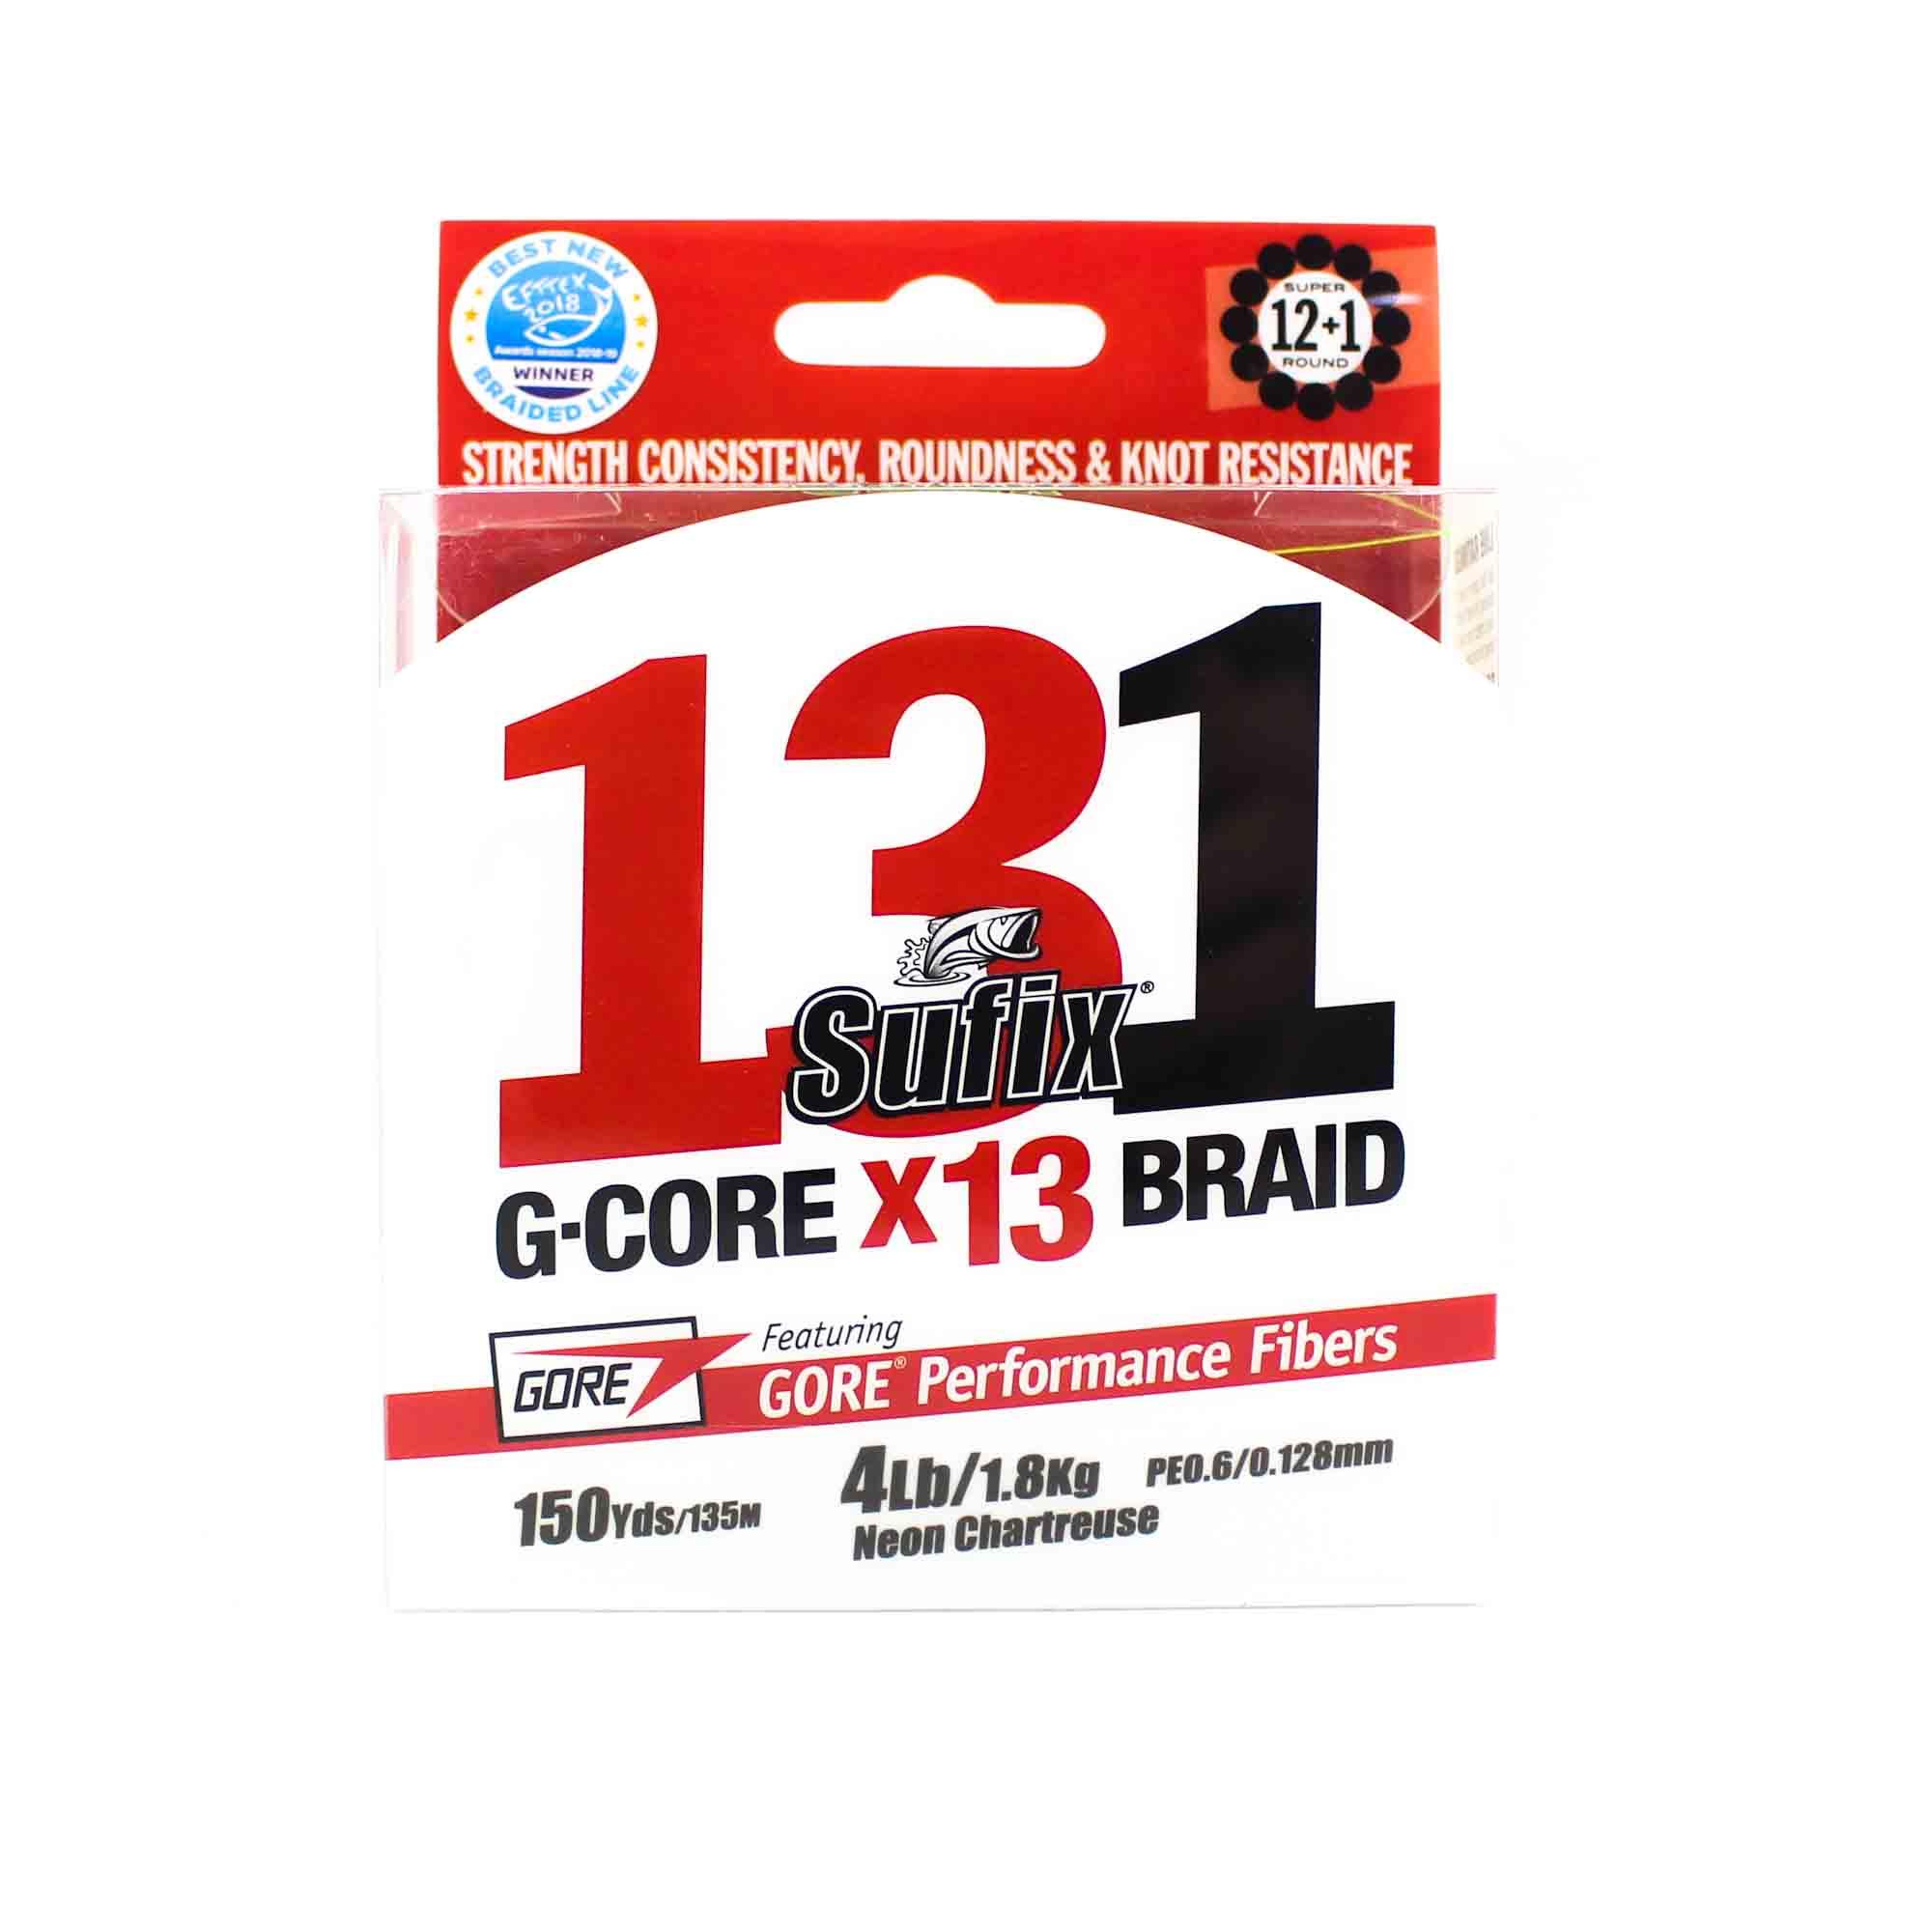 Sufix Braided 131 G-Core X13 Line 150yds 4lb Neon Chart (3840)